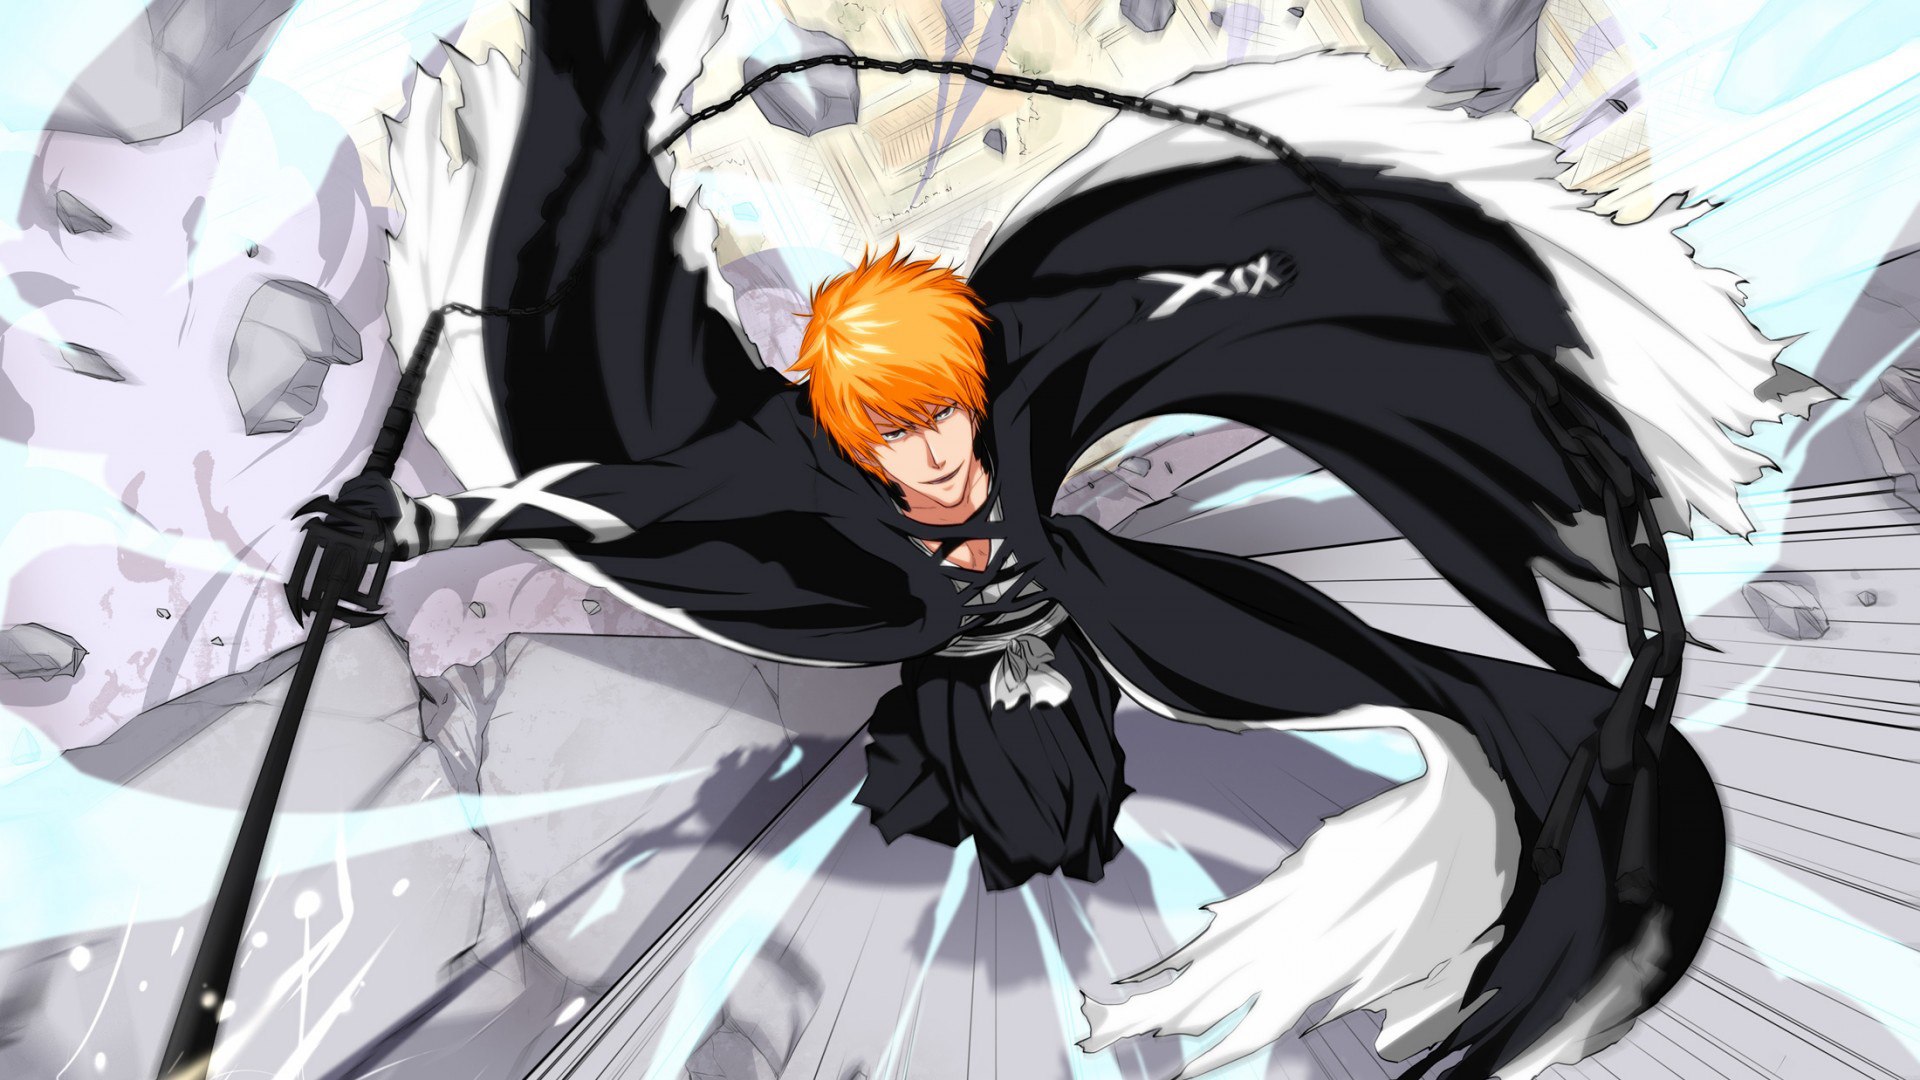 Anime Manga Wallpapers Full Hd Download ...